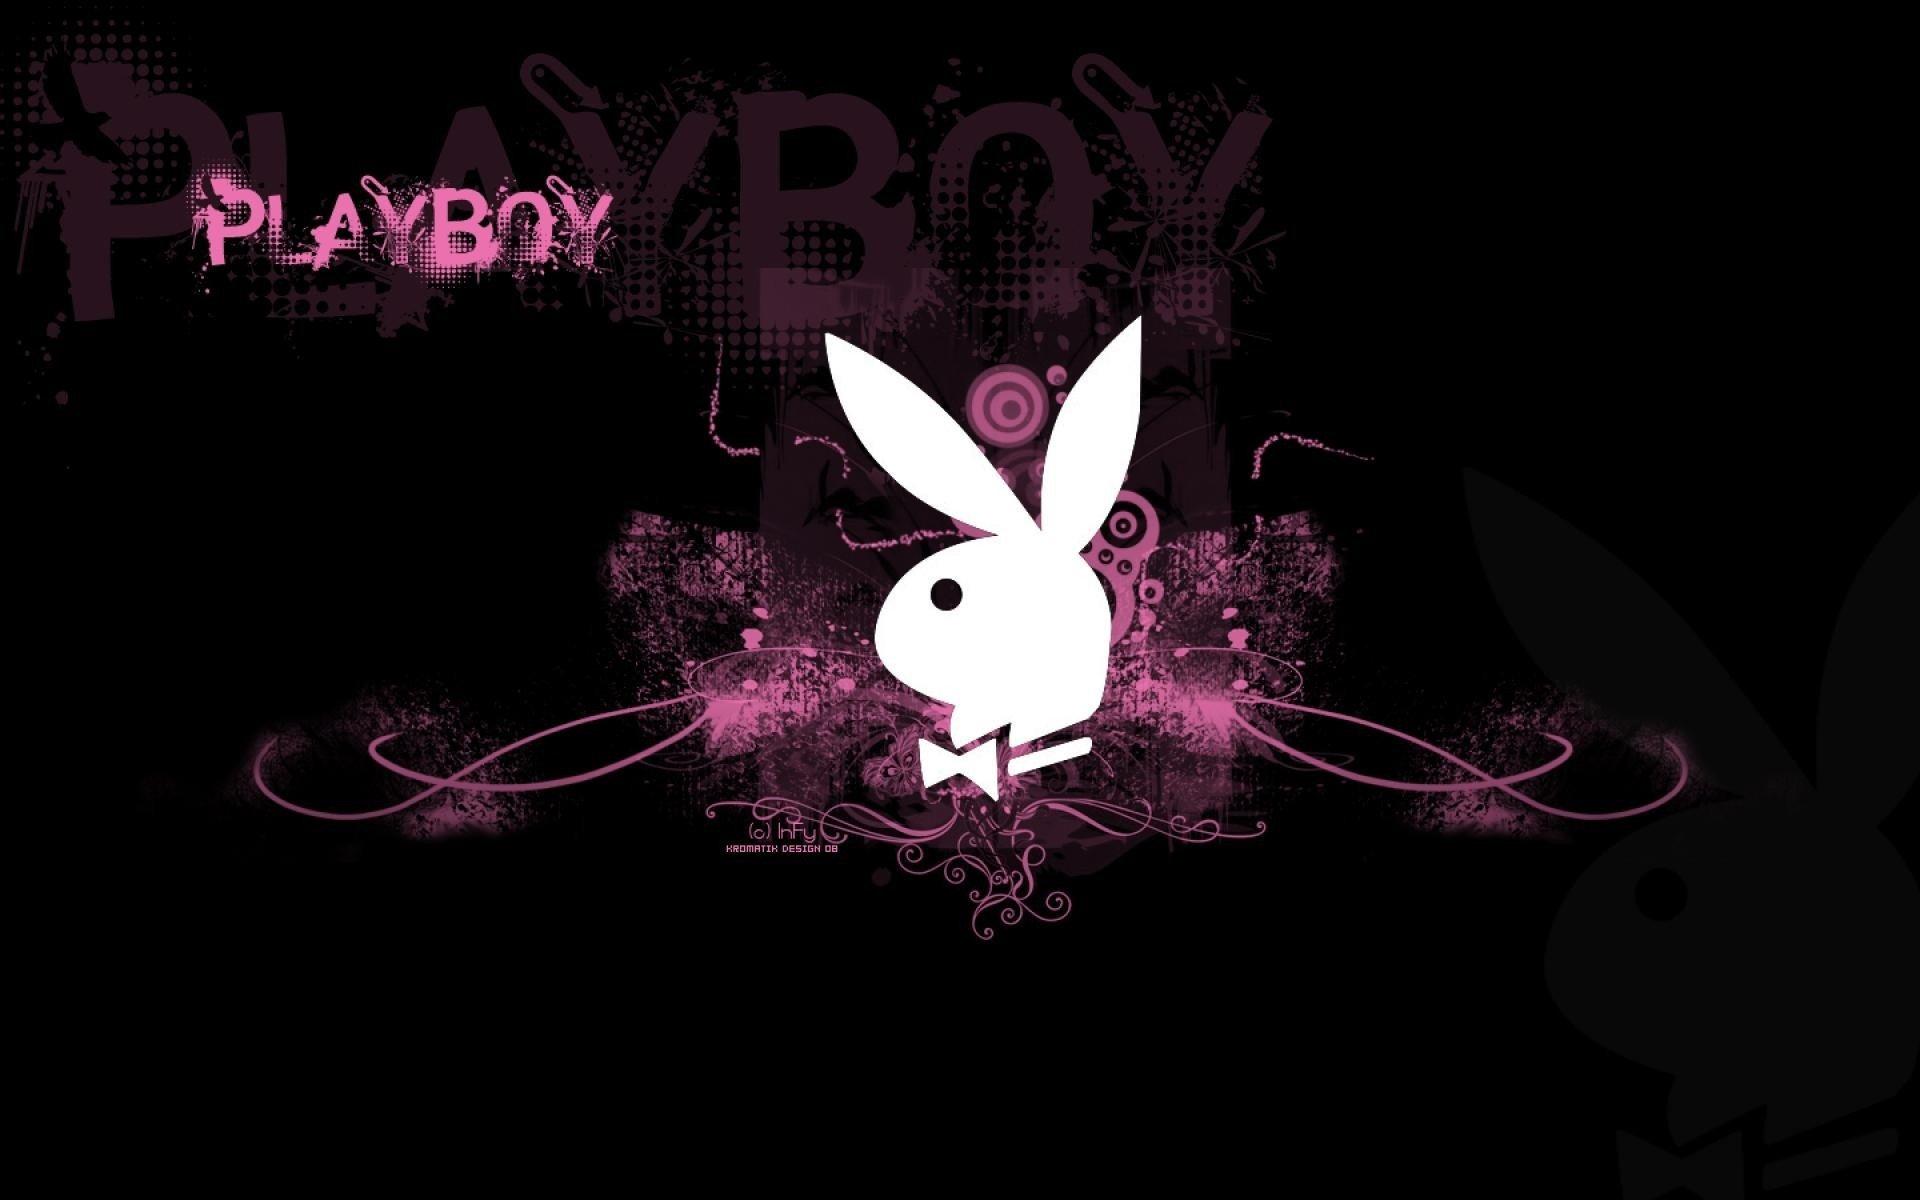 PLAYBOY adult logo poster (2) wallpaper   1920x1200   318976   WallpaperUP